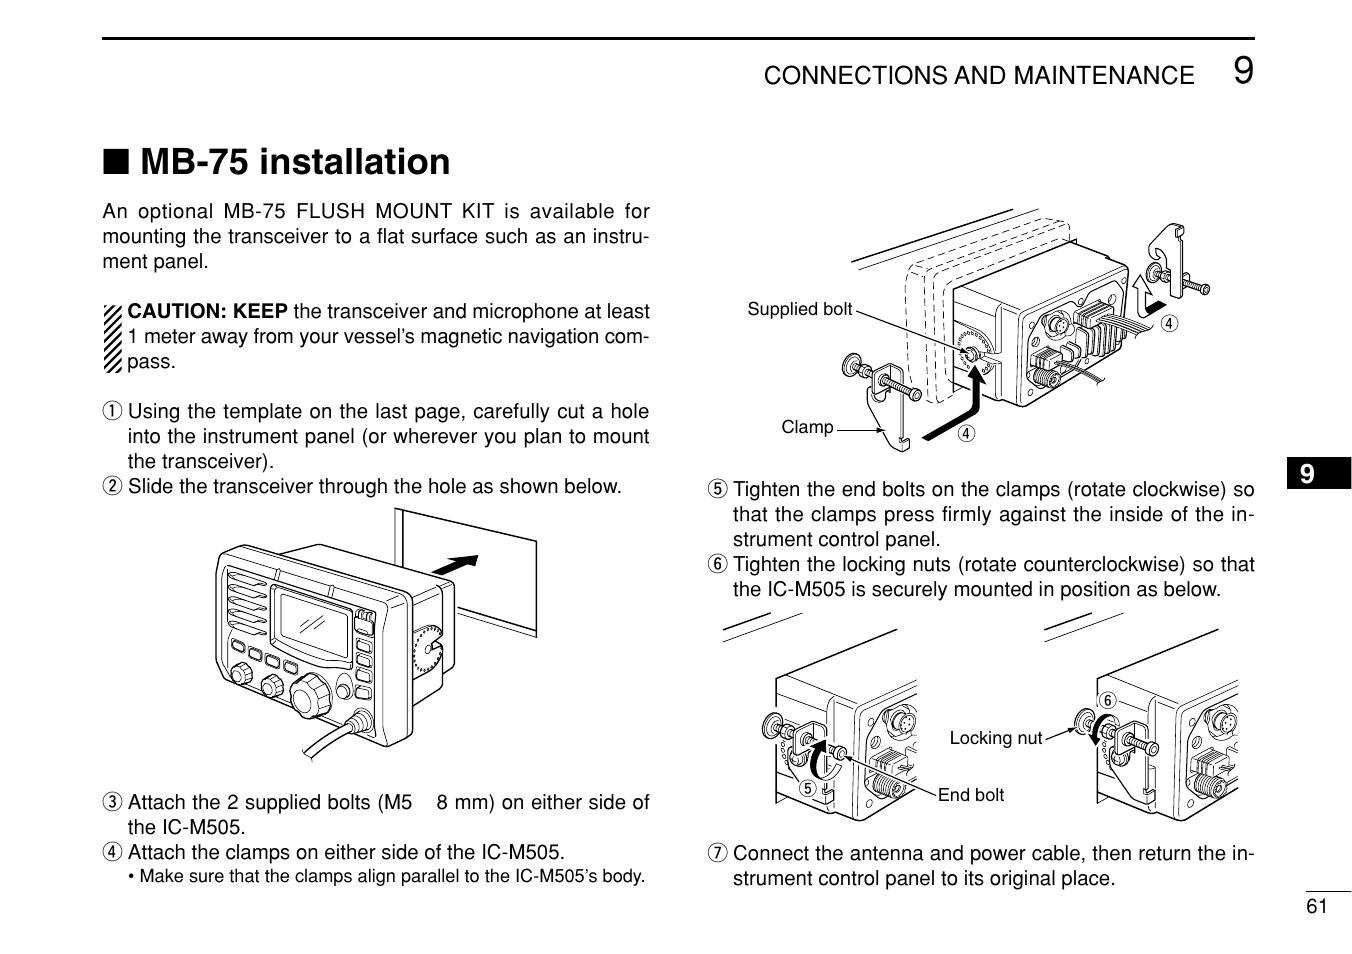 mb 75 installation icom ic m505 user manual page 67 80 rh manualsdir com Logitech M505 Not Working Palm M505 Software